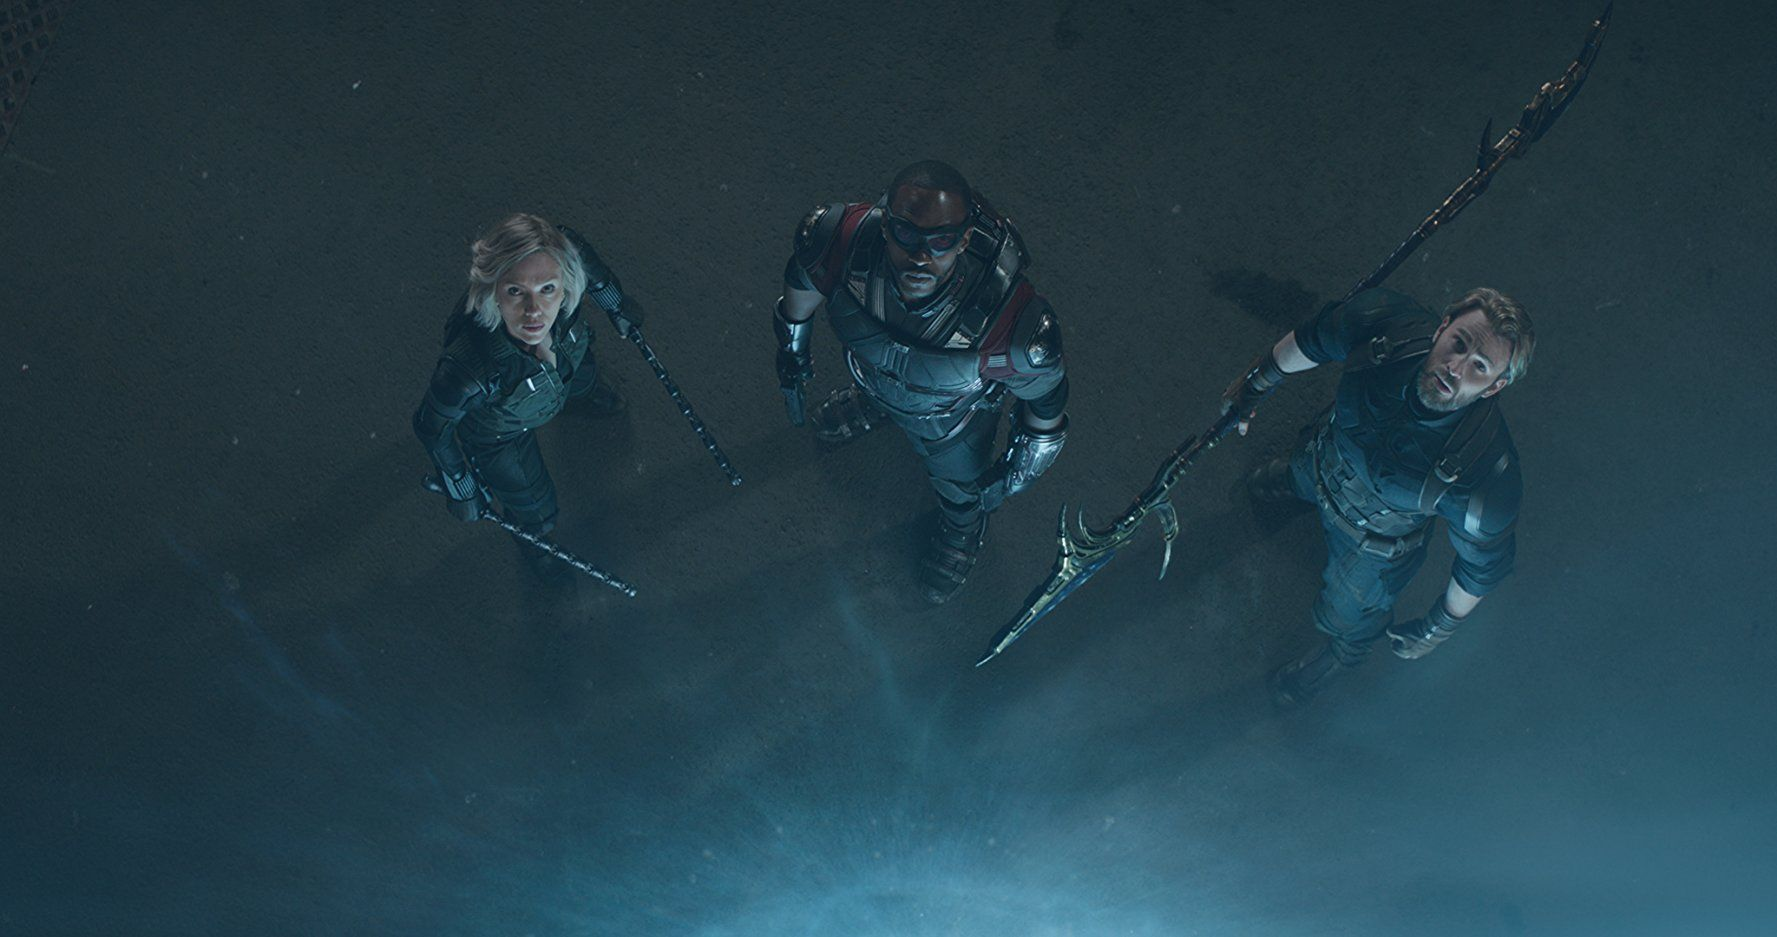 Chris Evans, Scarlett Johansson, and Anthony Mackie in